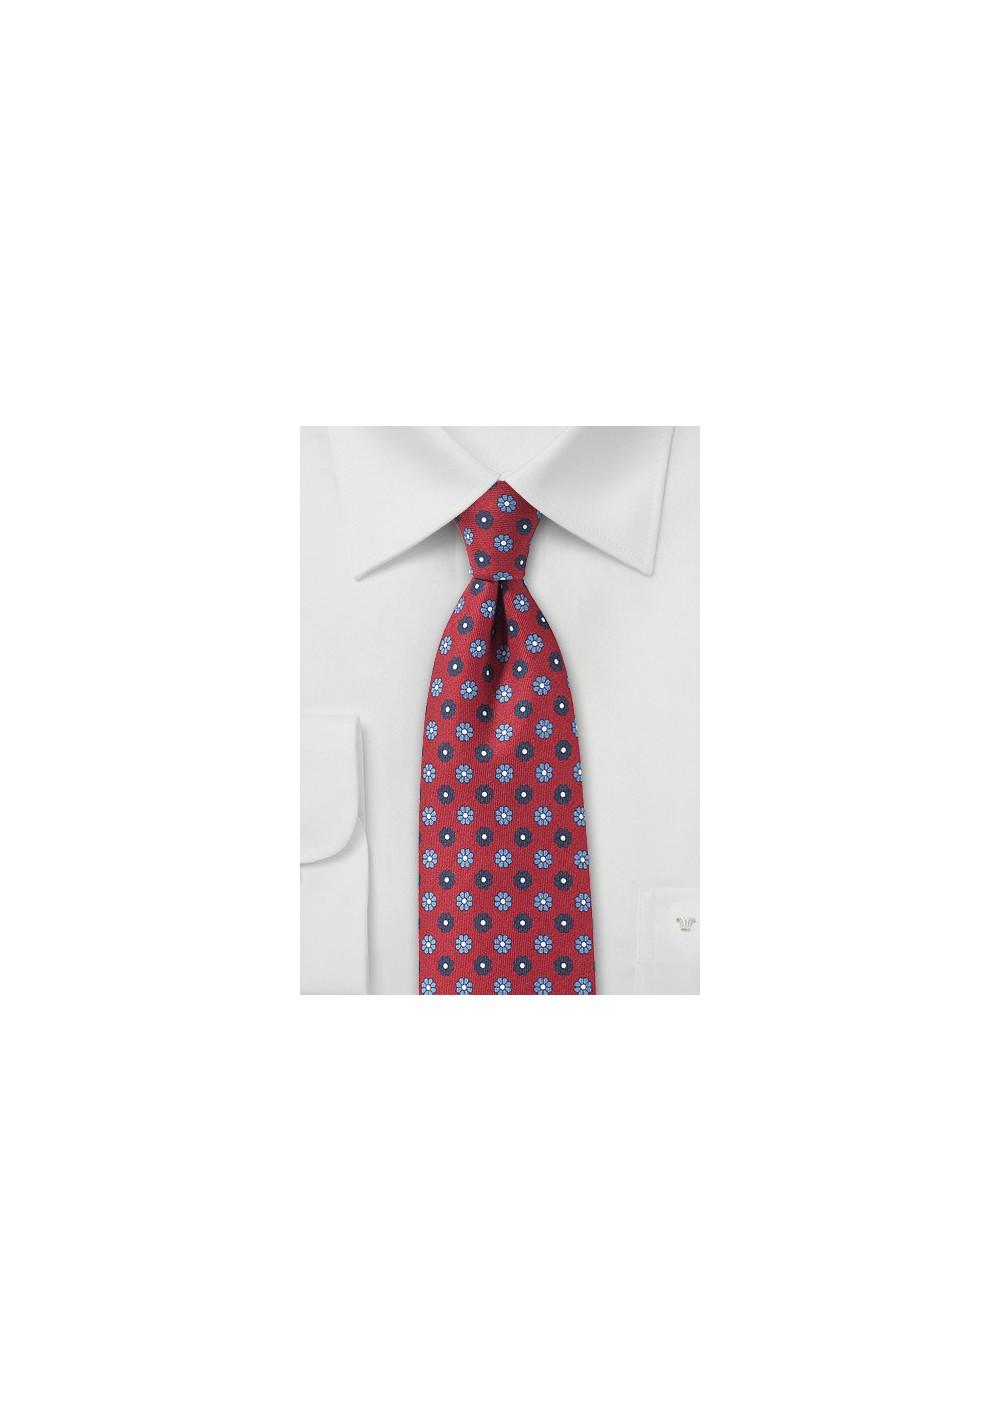 Cherry Red Floral Tie in Slim Width